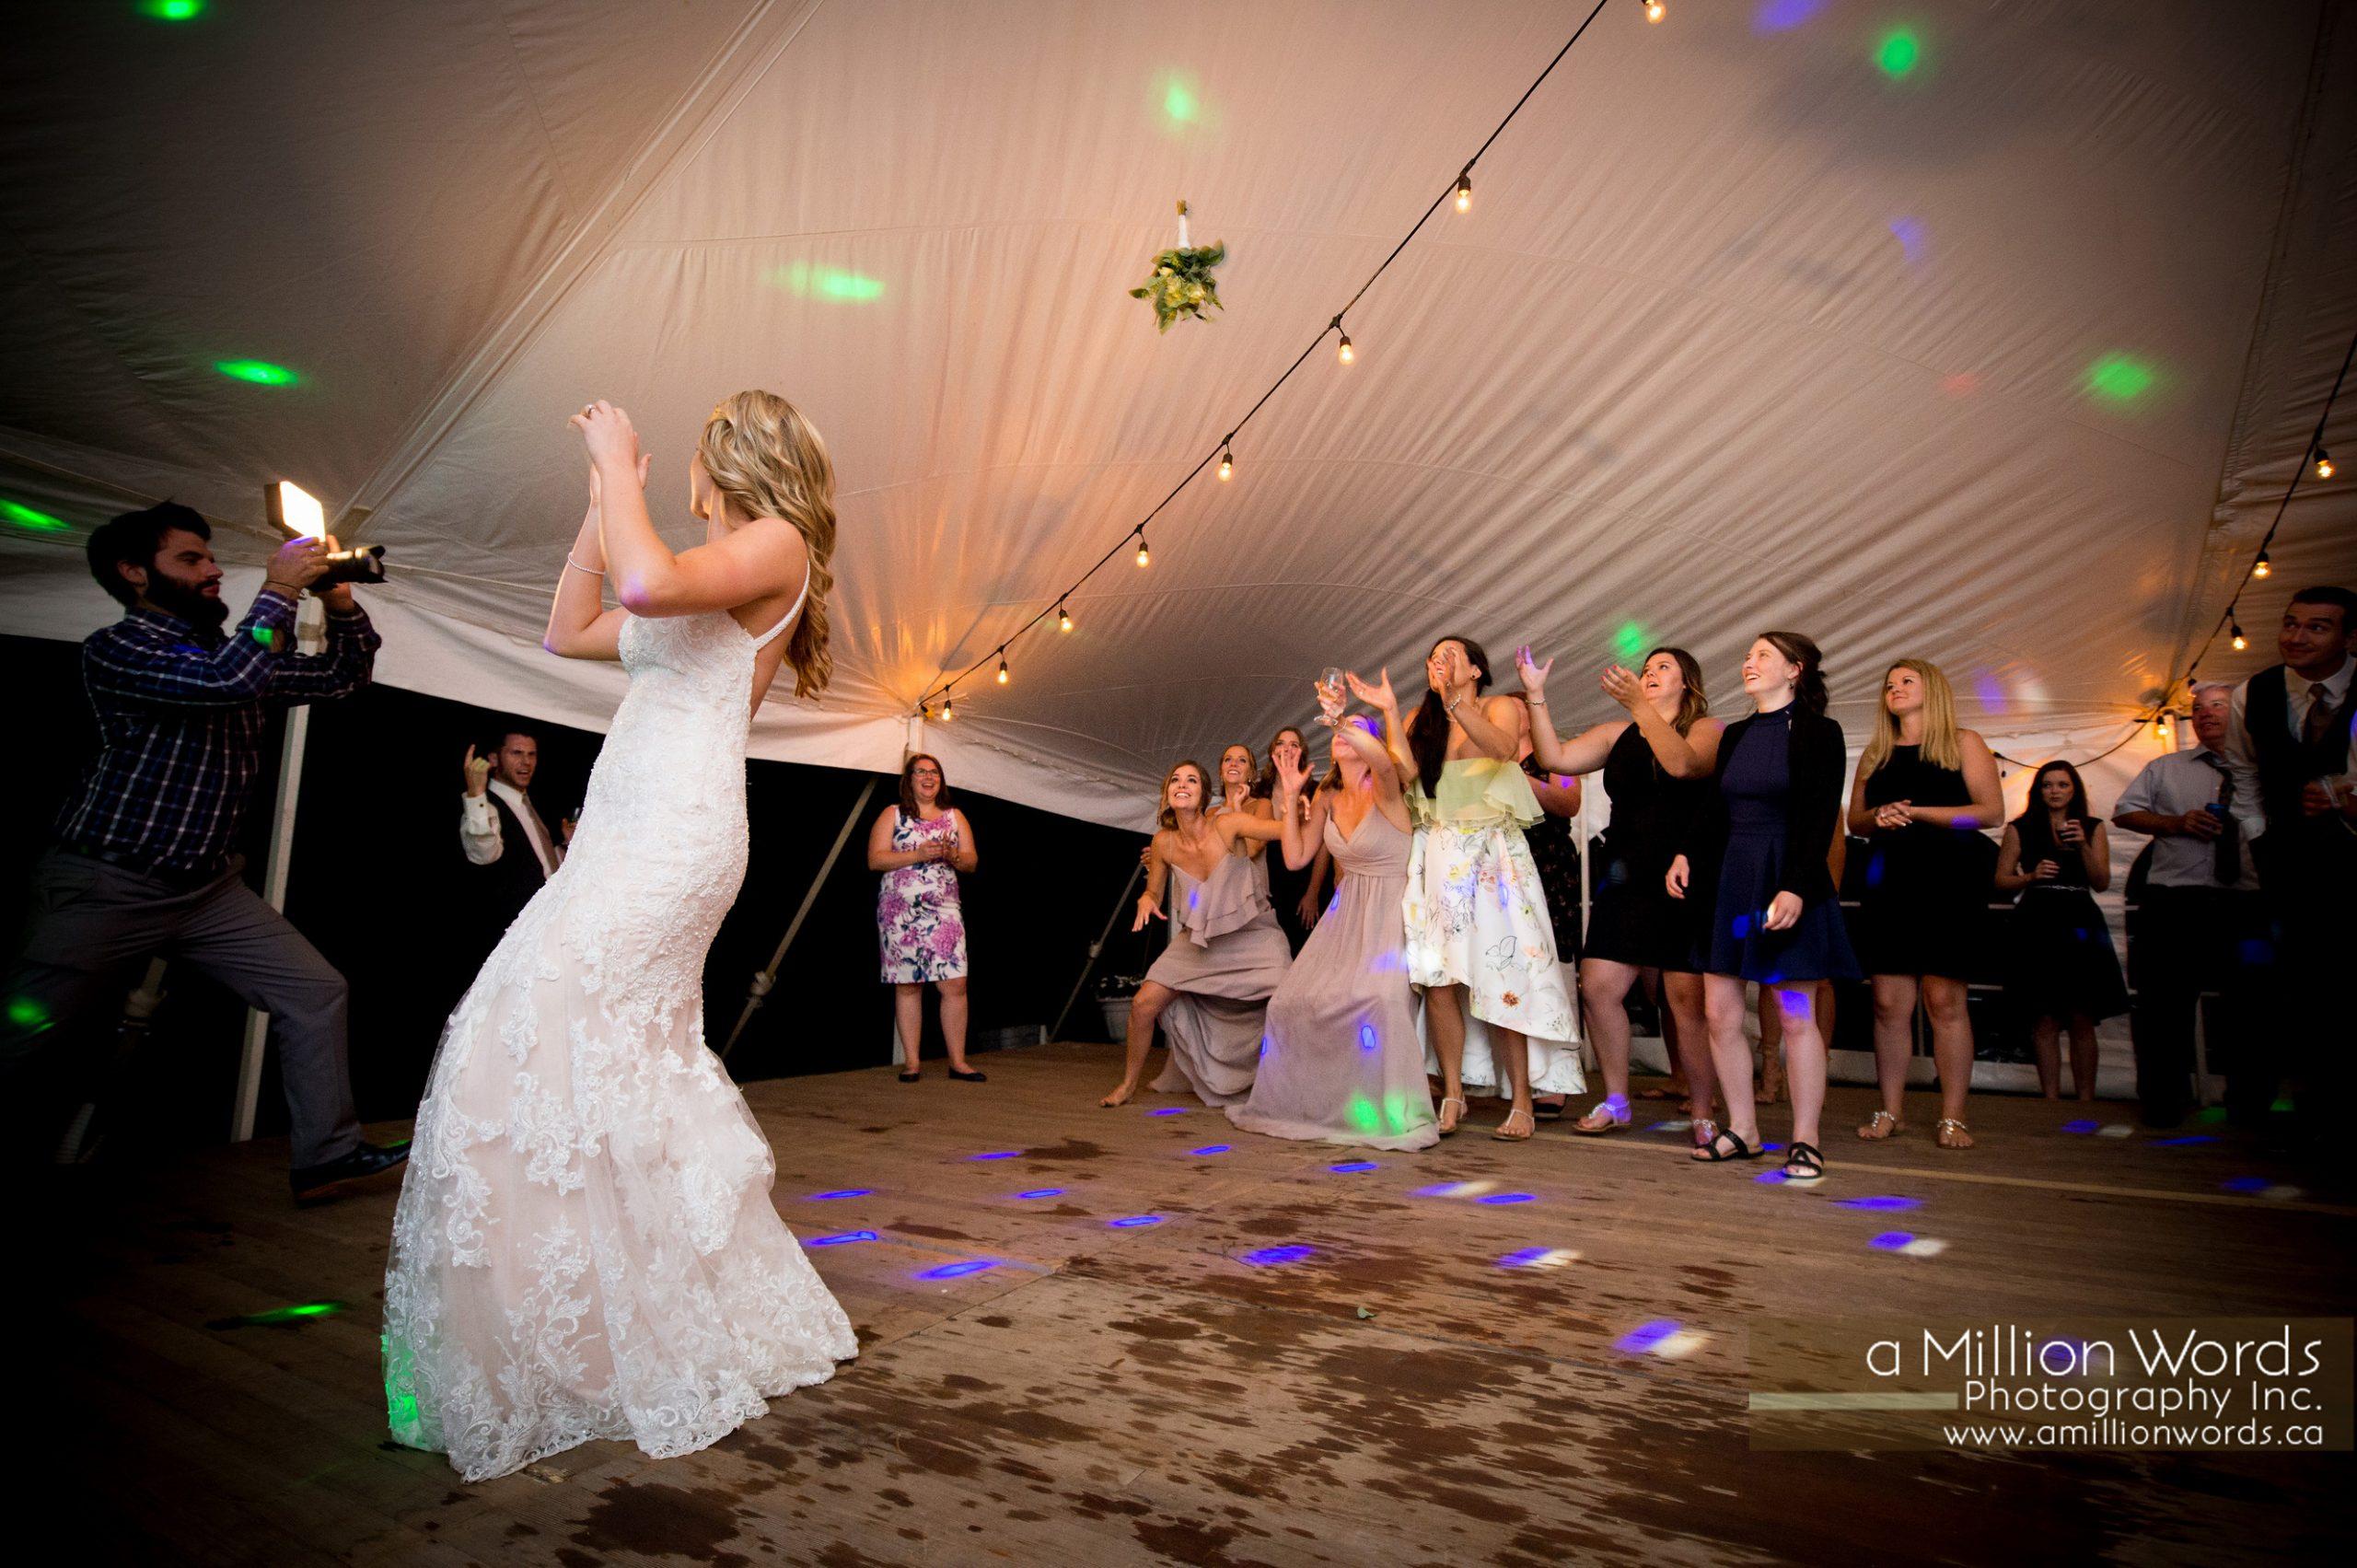 arthur_wedding_photographer83